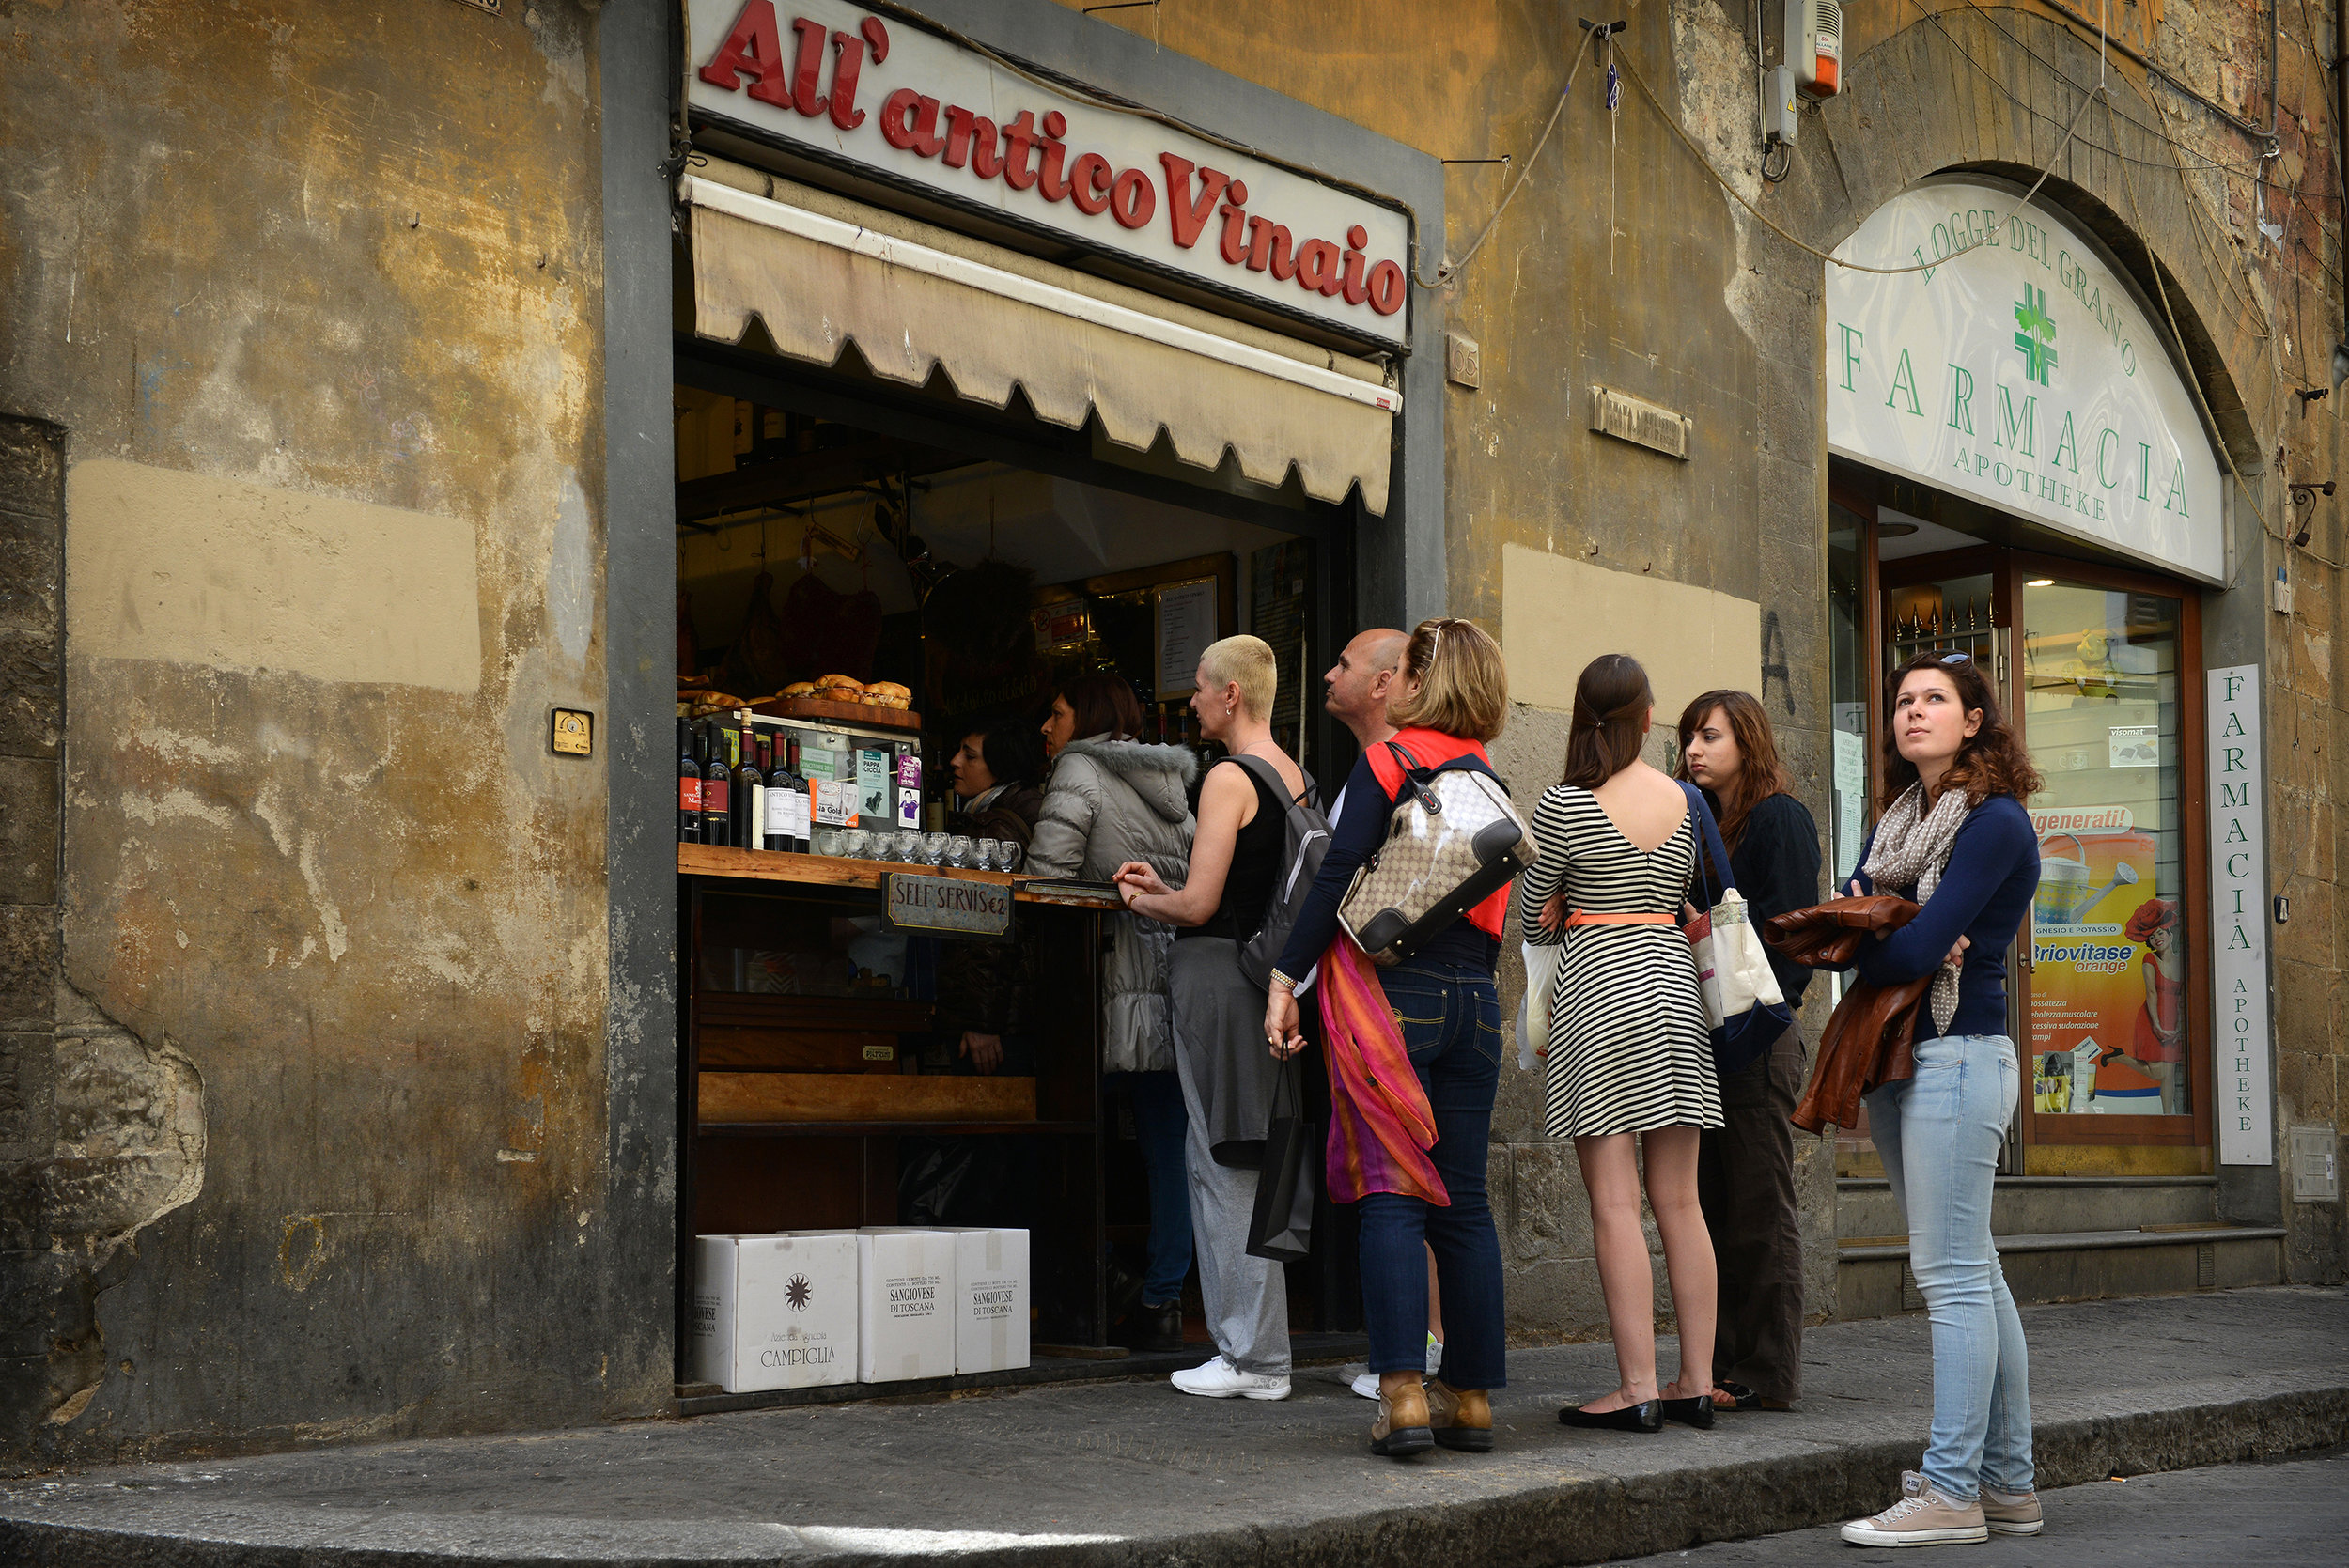 Italia, Firenze, Toscana, viinibaari